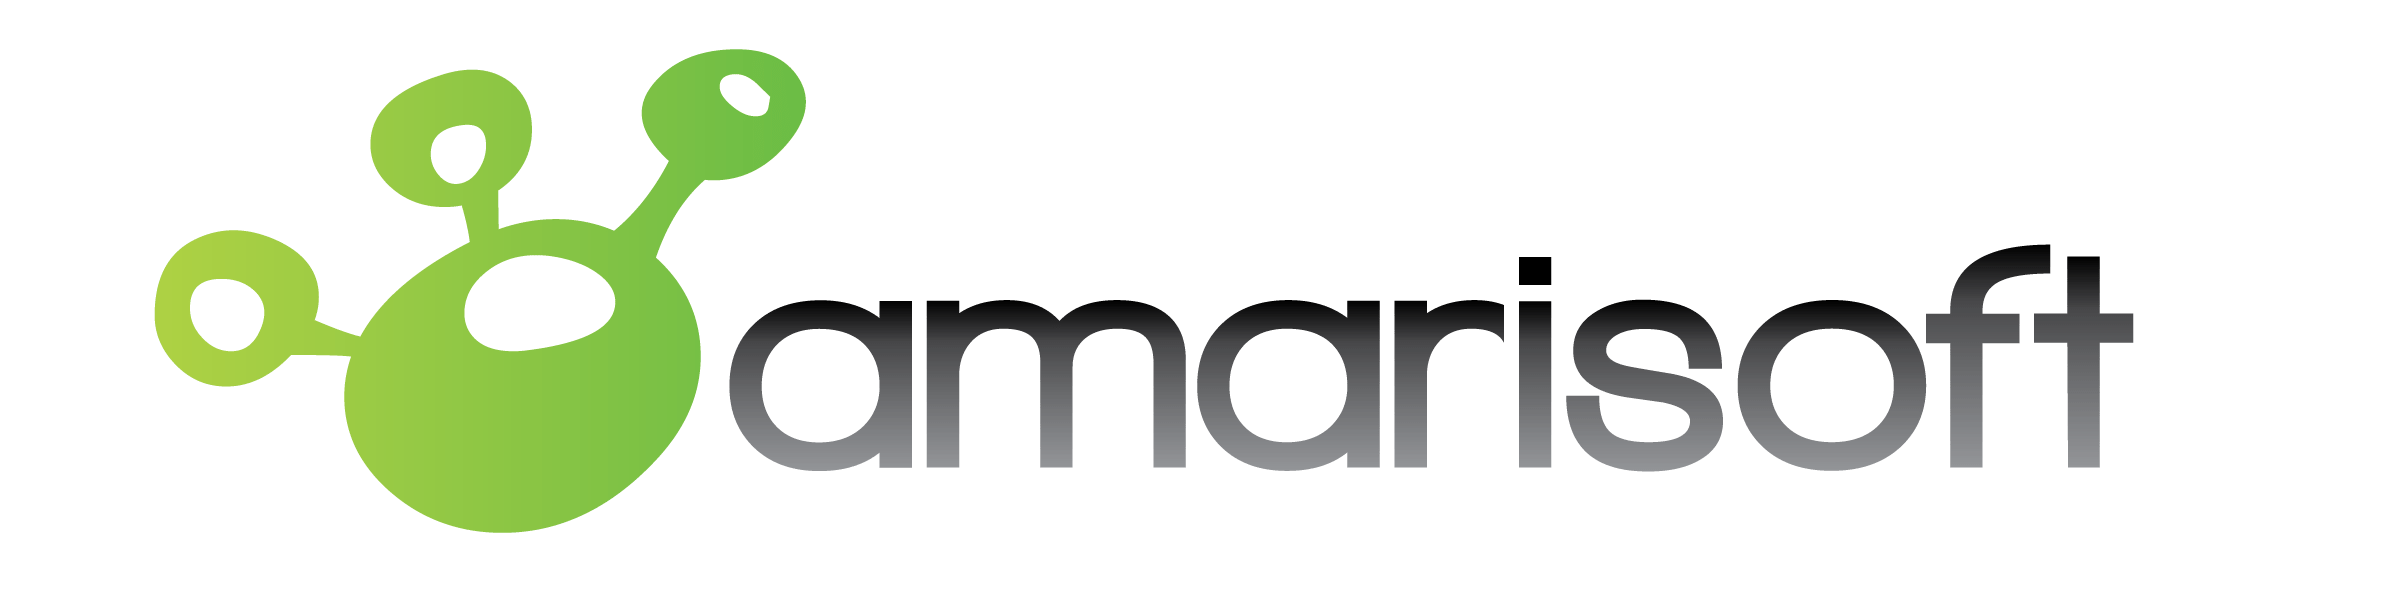 Amarisoft 5G網路模擬方案